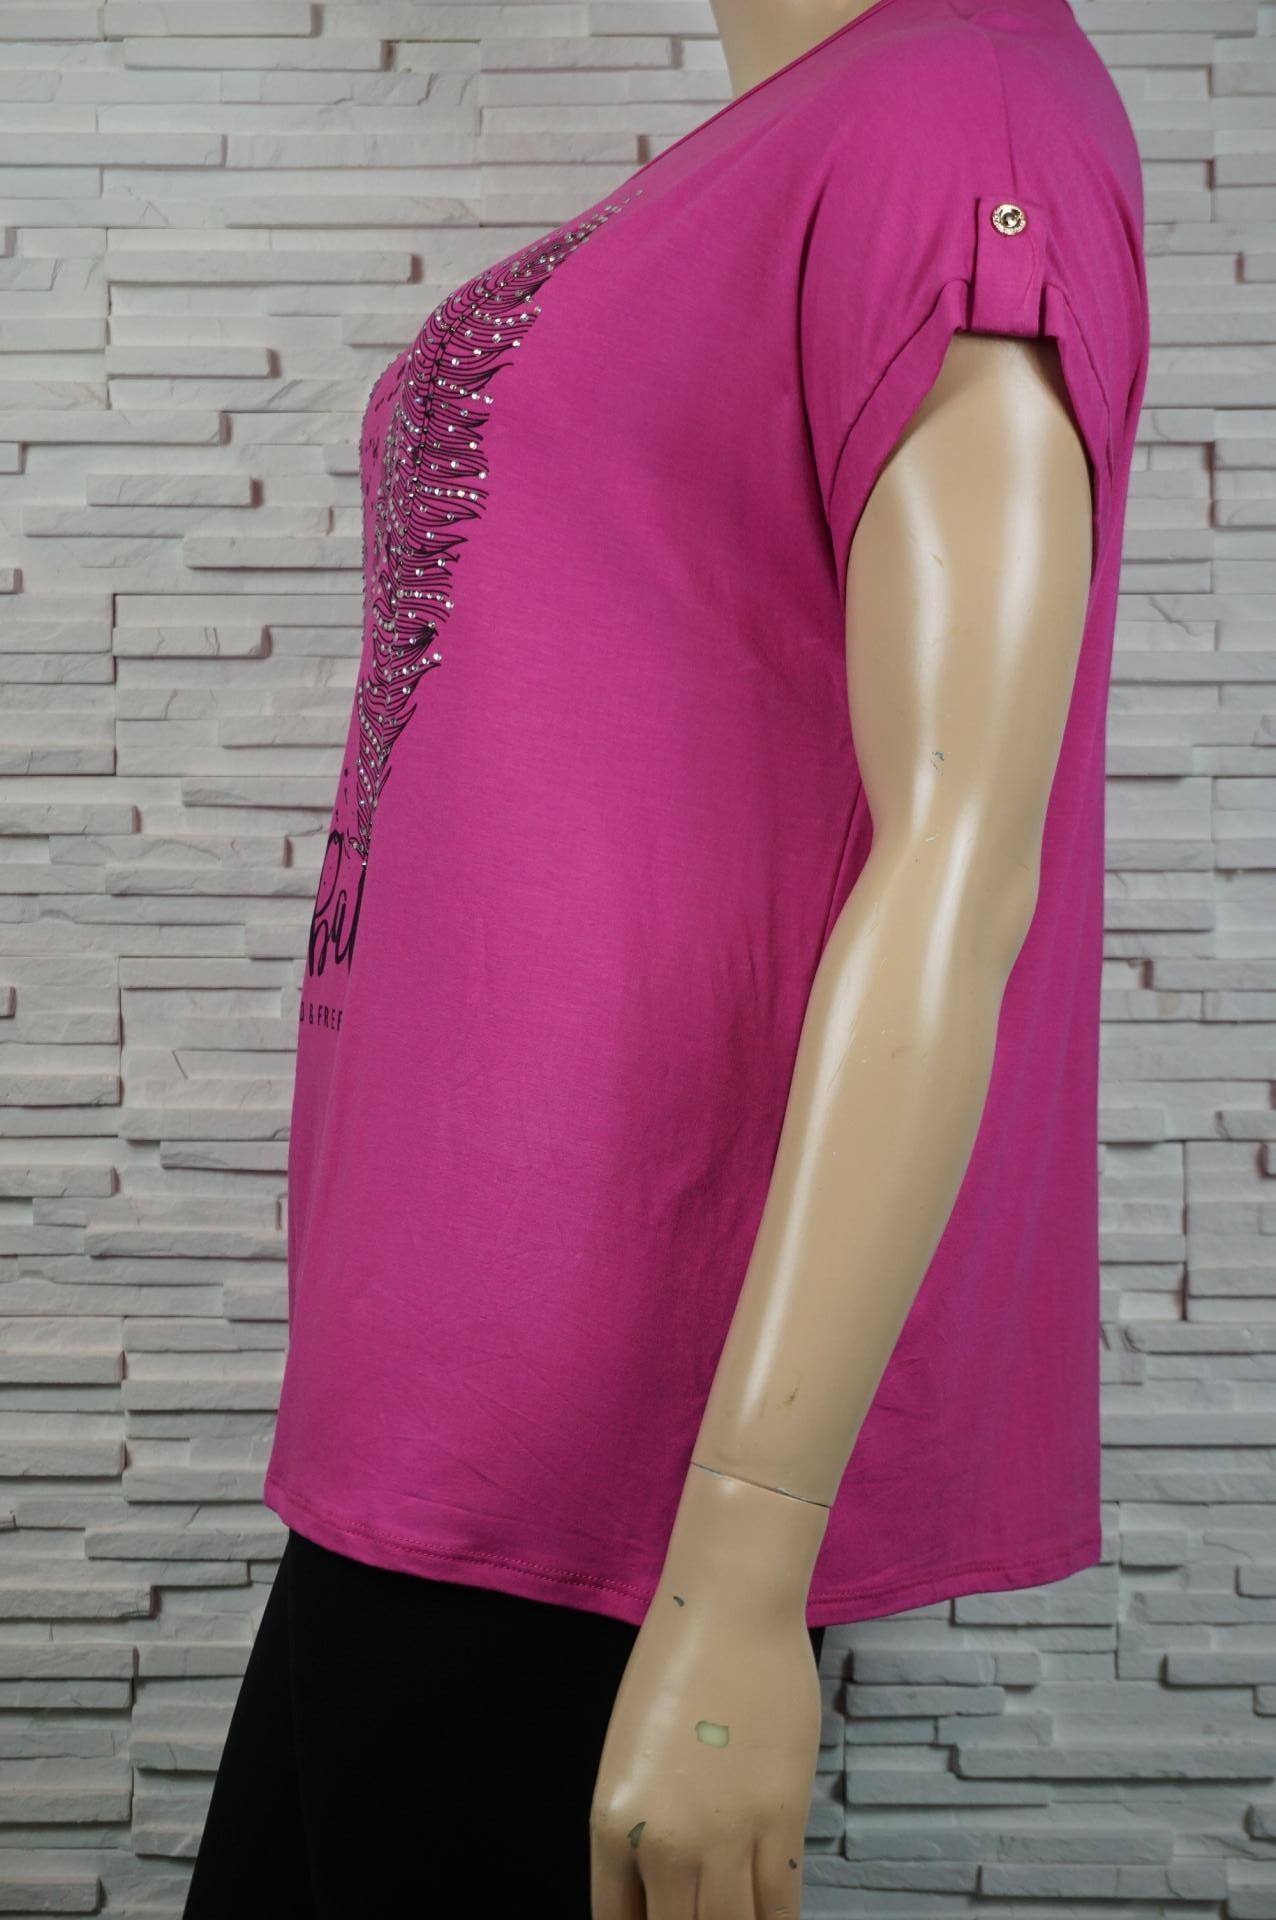 tee-shirt long à 3 plumes en strass